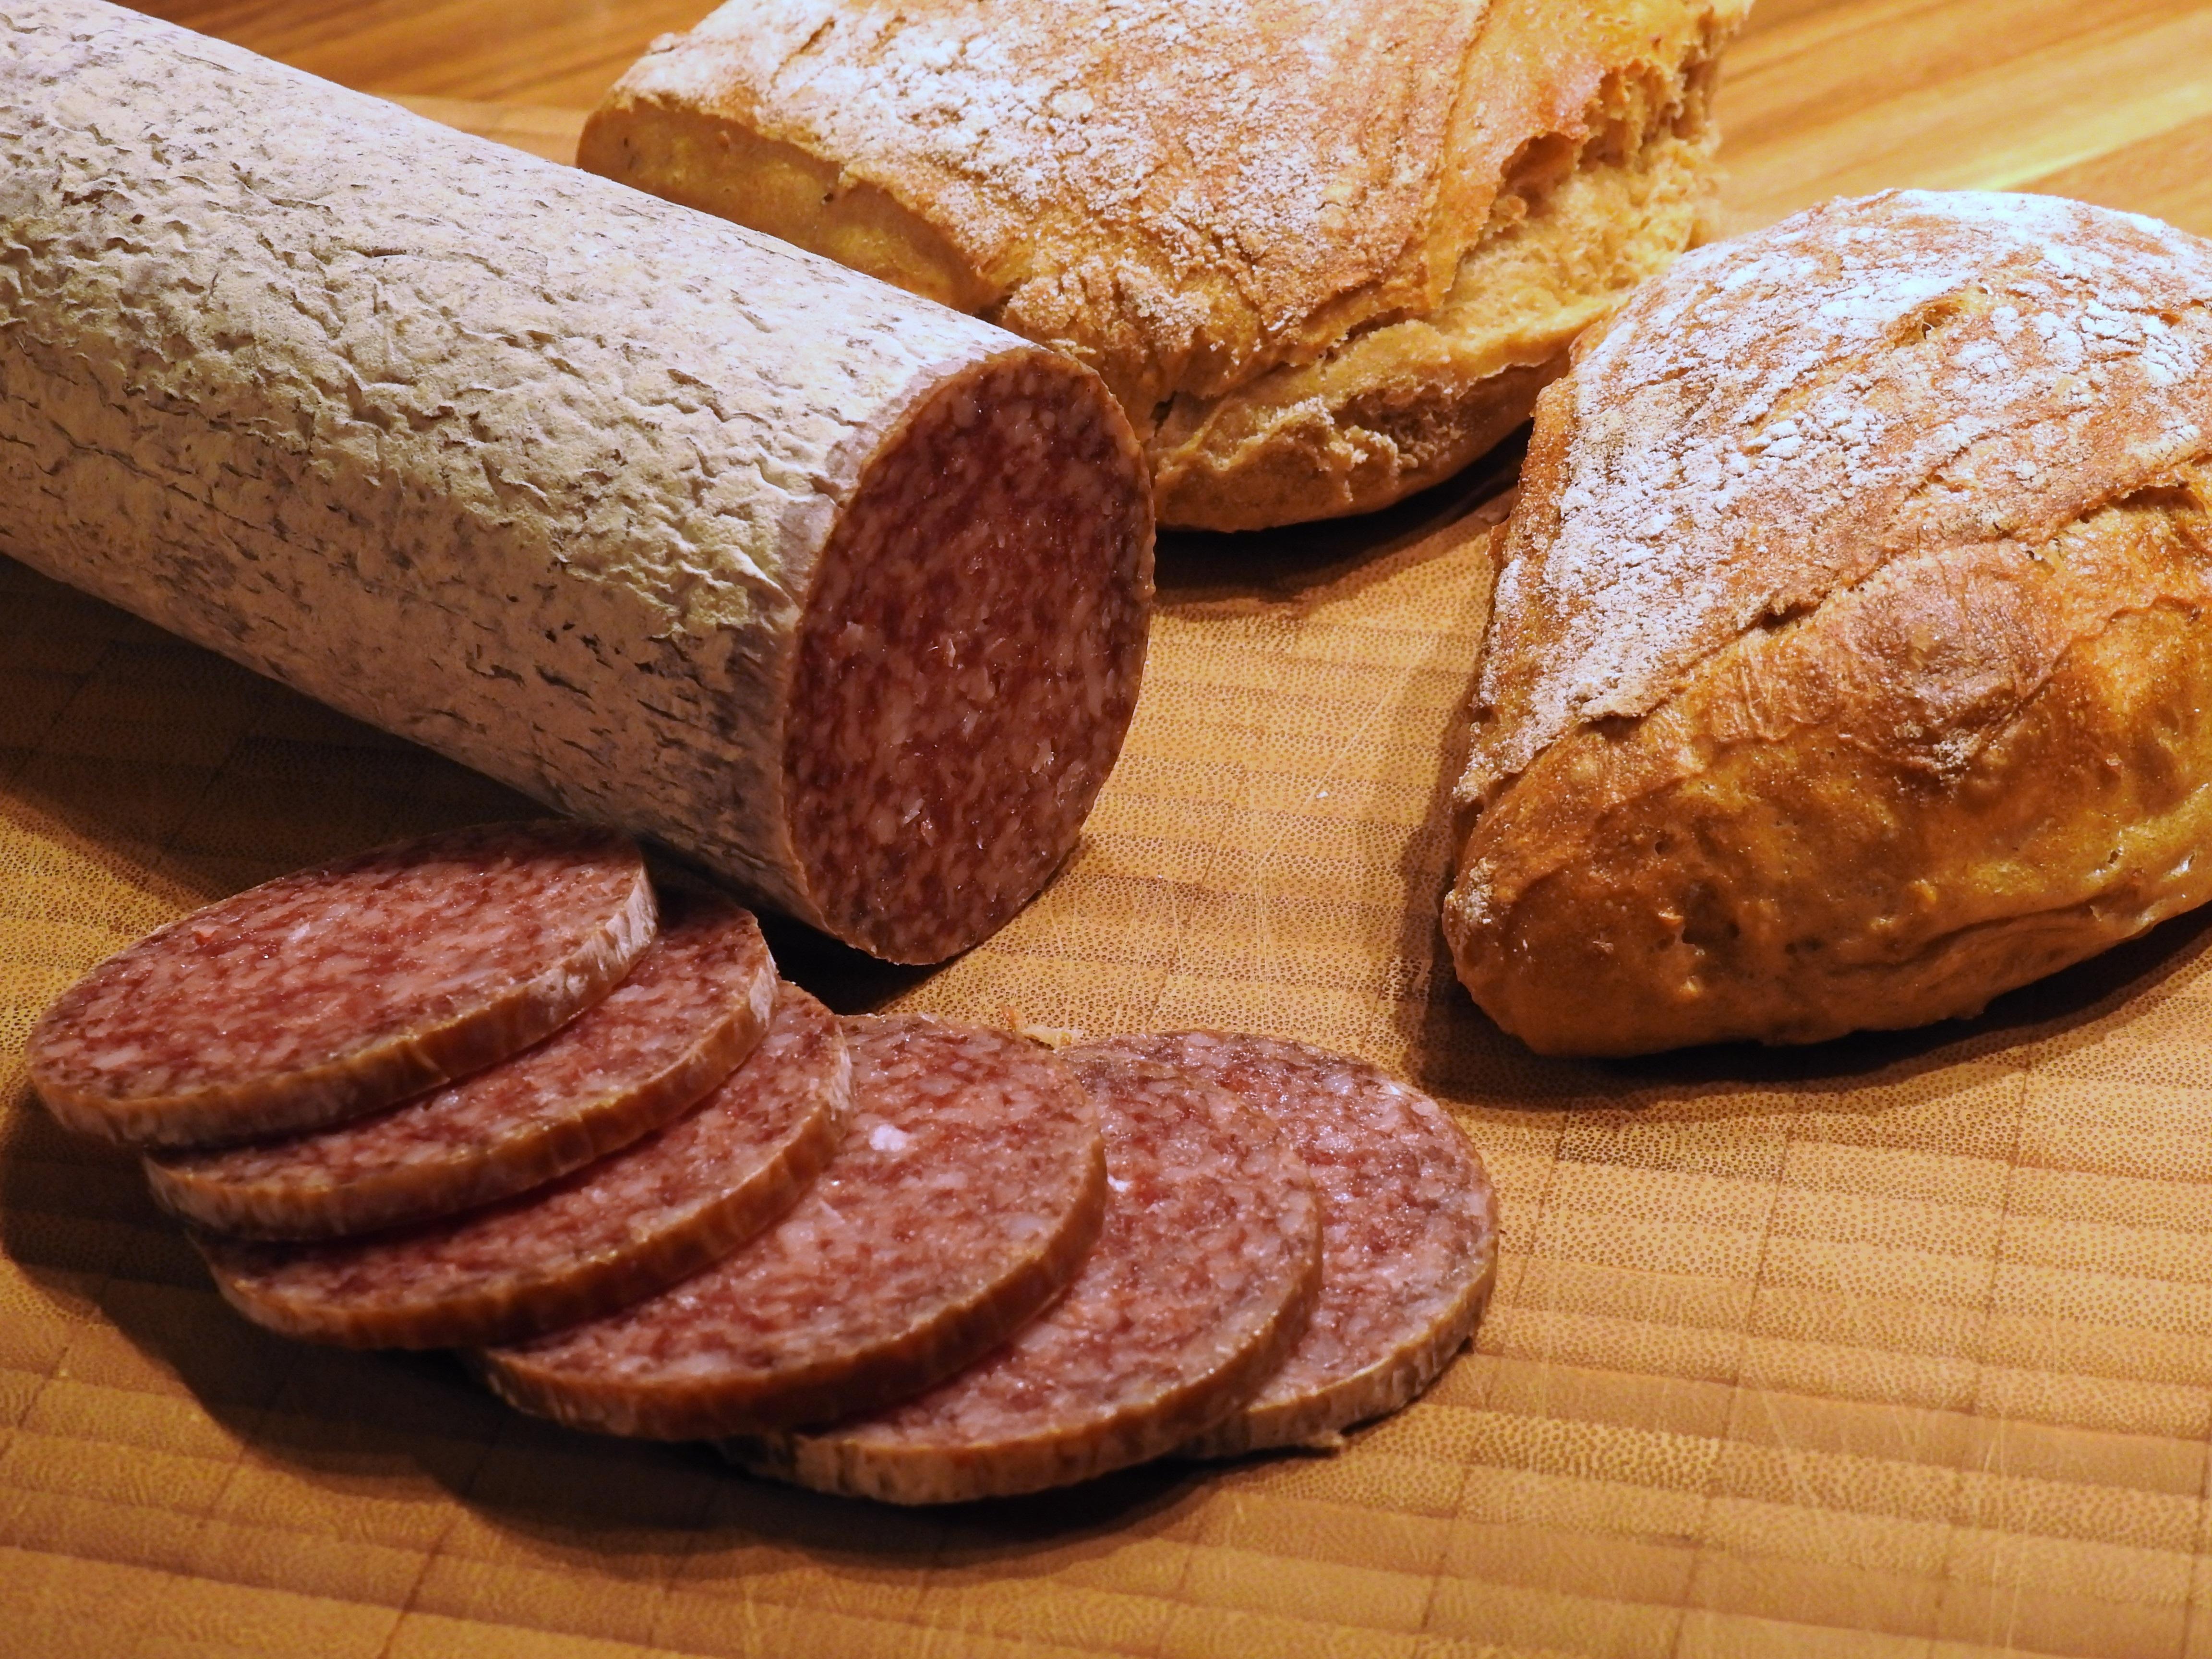 пятак место картинки колбаса с хлебом жизни